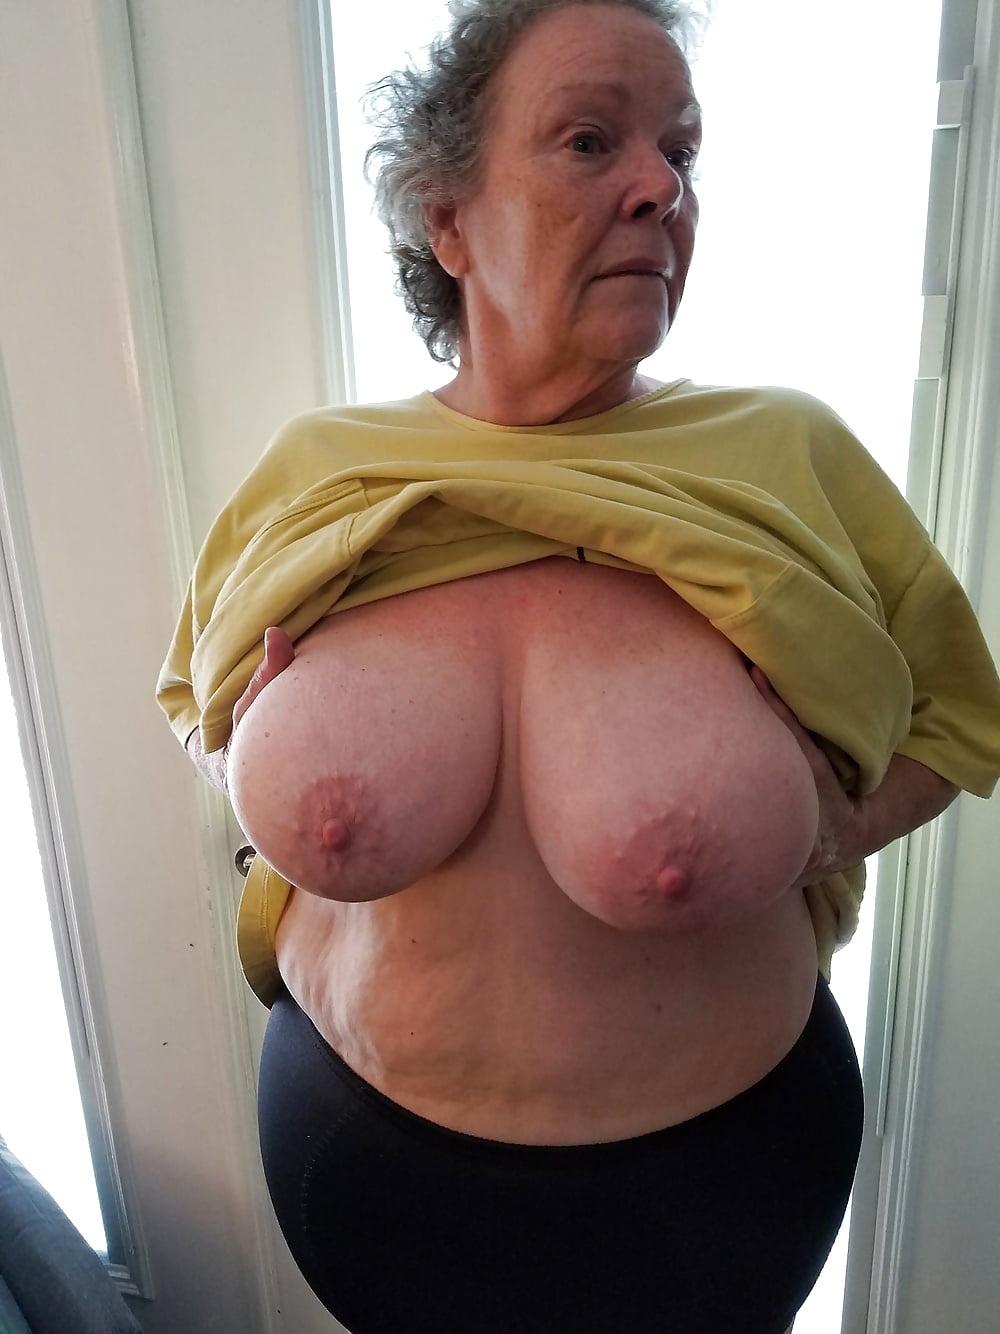 Girls trampolines free big old boobs video sex